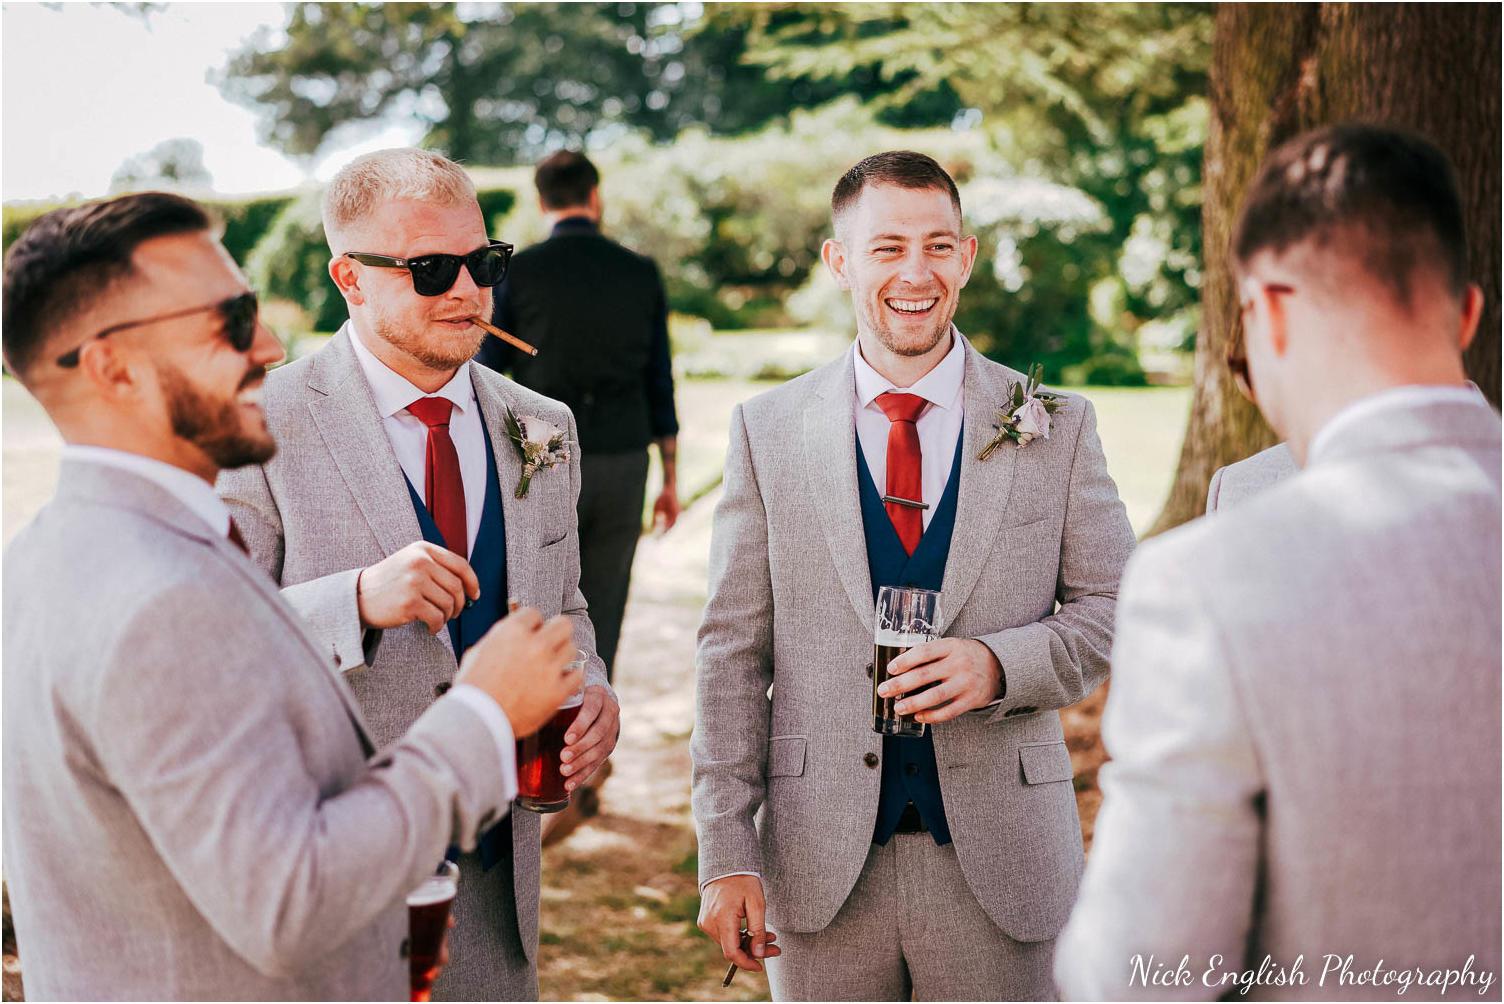 Eaves_Hall_Outdoor_Wedding-87.jpg